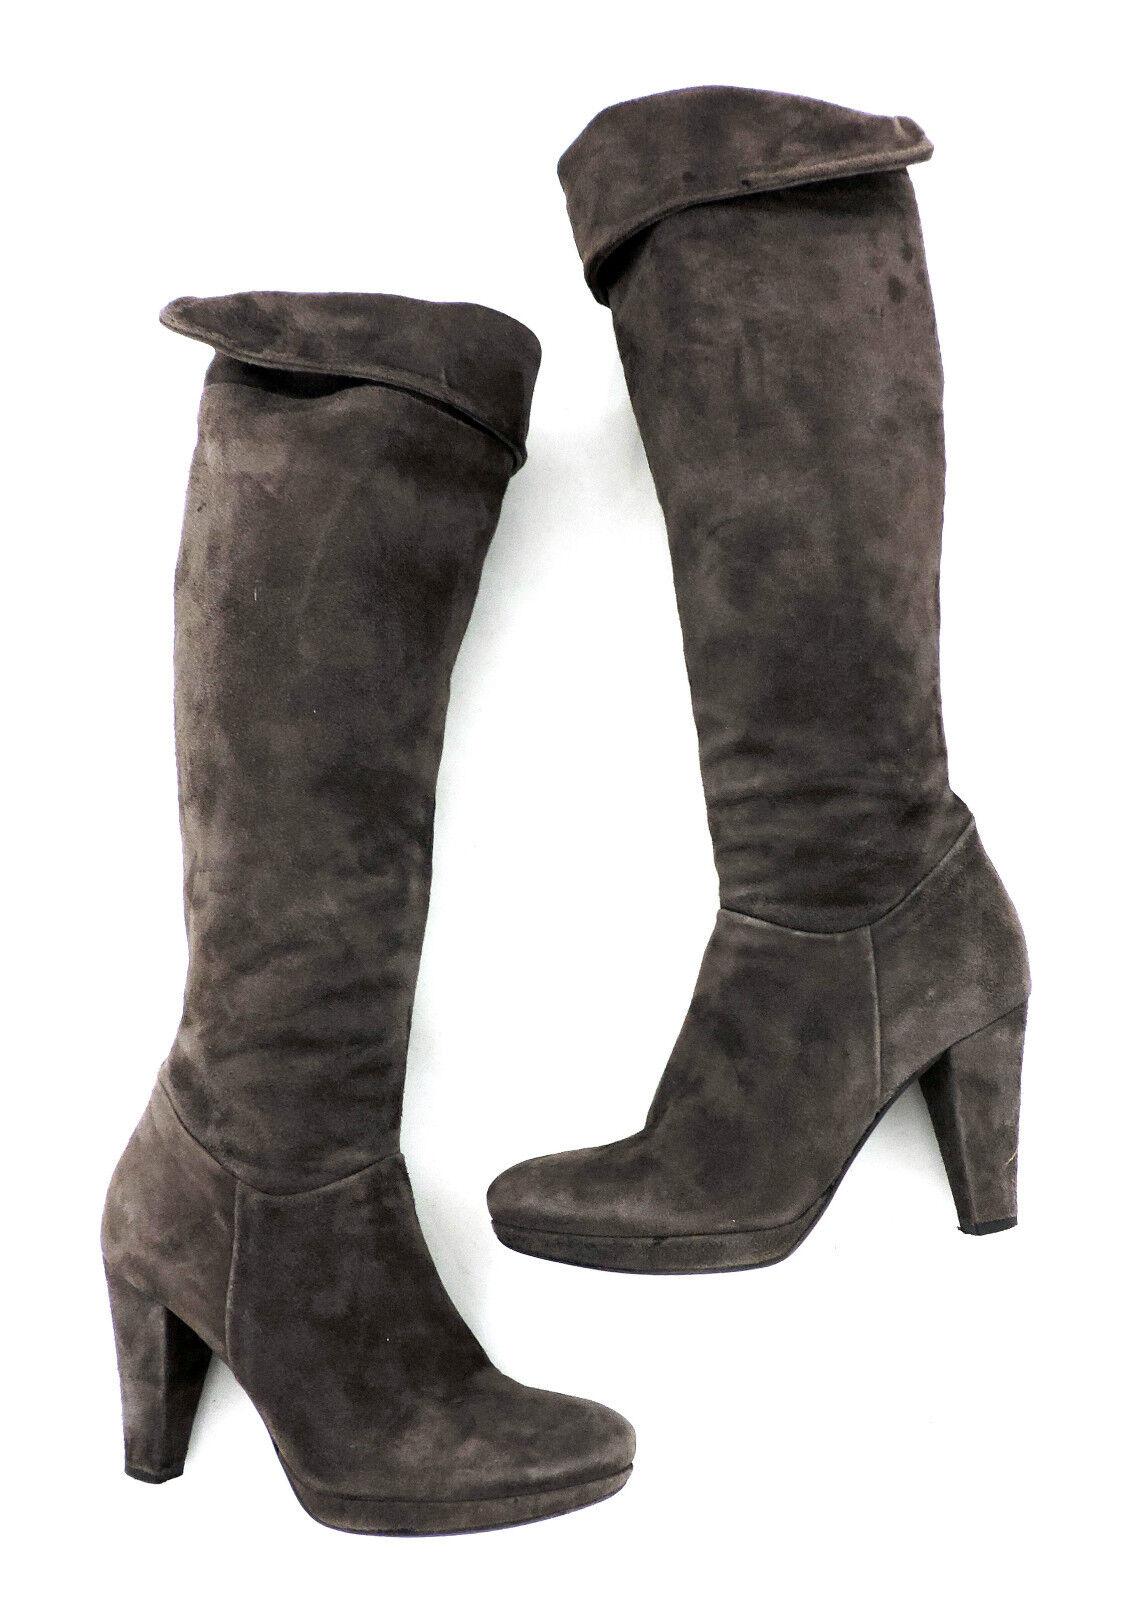 Progetto heels Stiefel 37 grau braun Wildleder high heels Progetto Stulpenstiefel wie neu Stiefel f04fbf